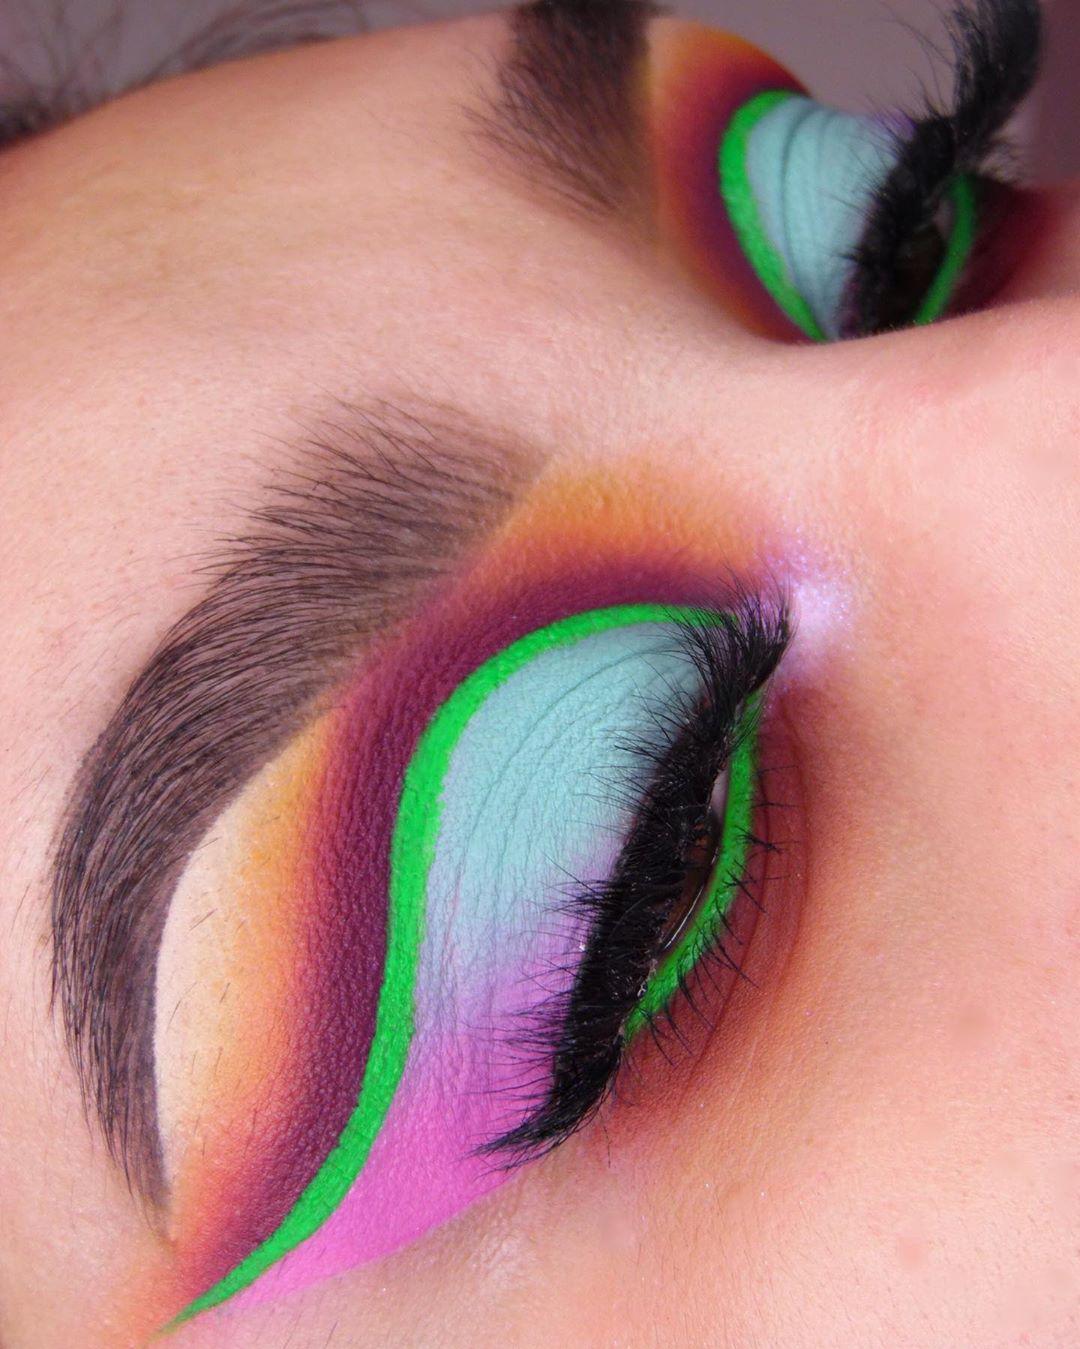 Hydra Fx Alien Queen 👽 I Definitely Nee Bperfectisolationcreations - Makeup Ideas